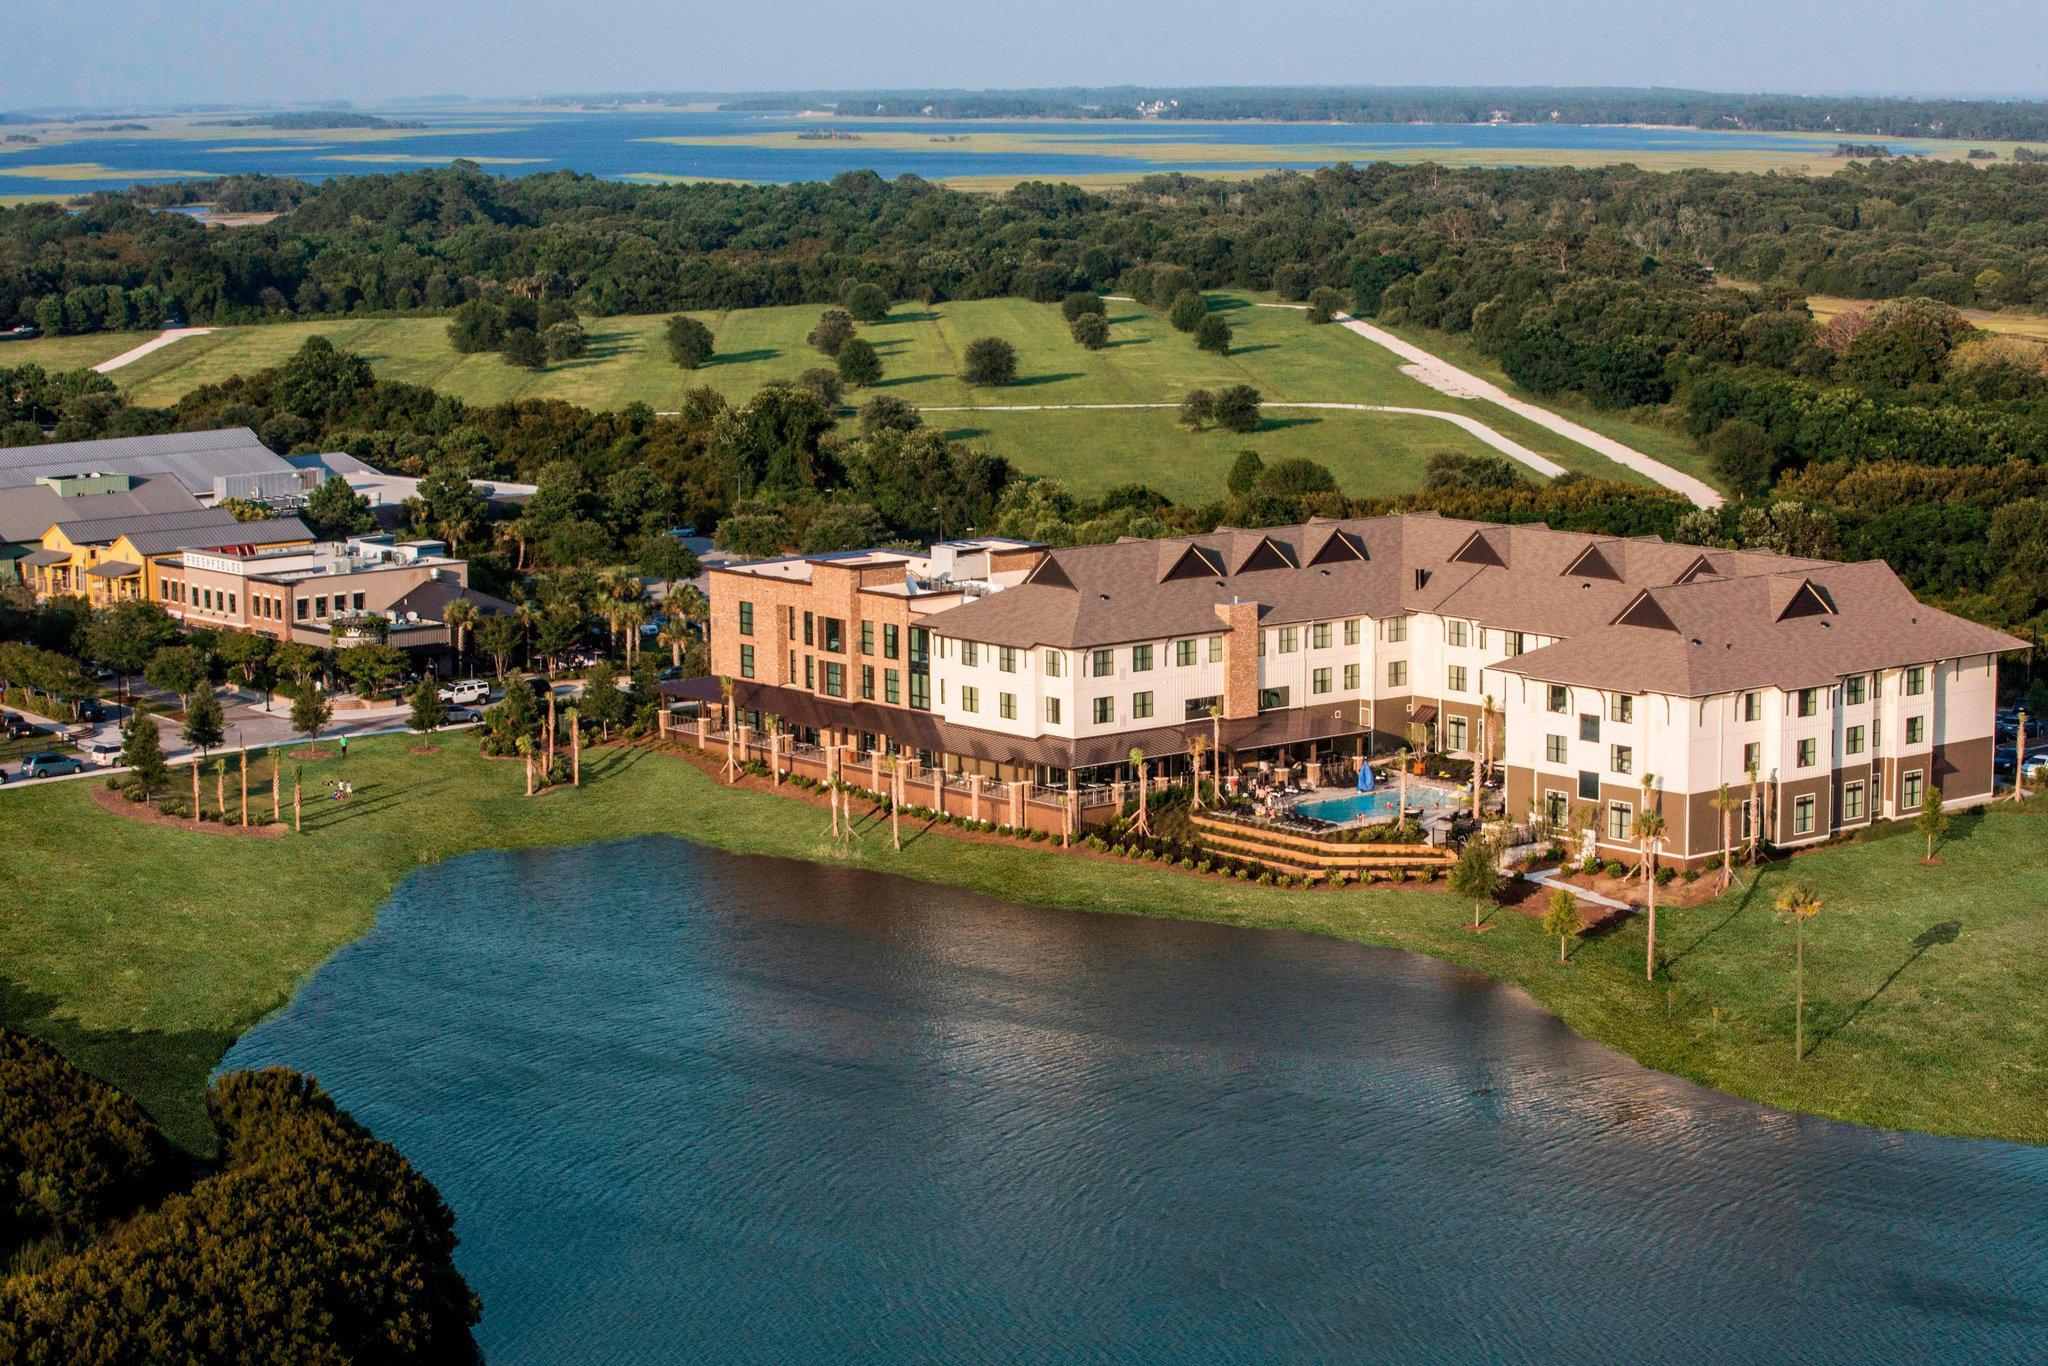 Charleston Kiawah Island/Andell Inn